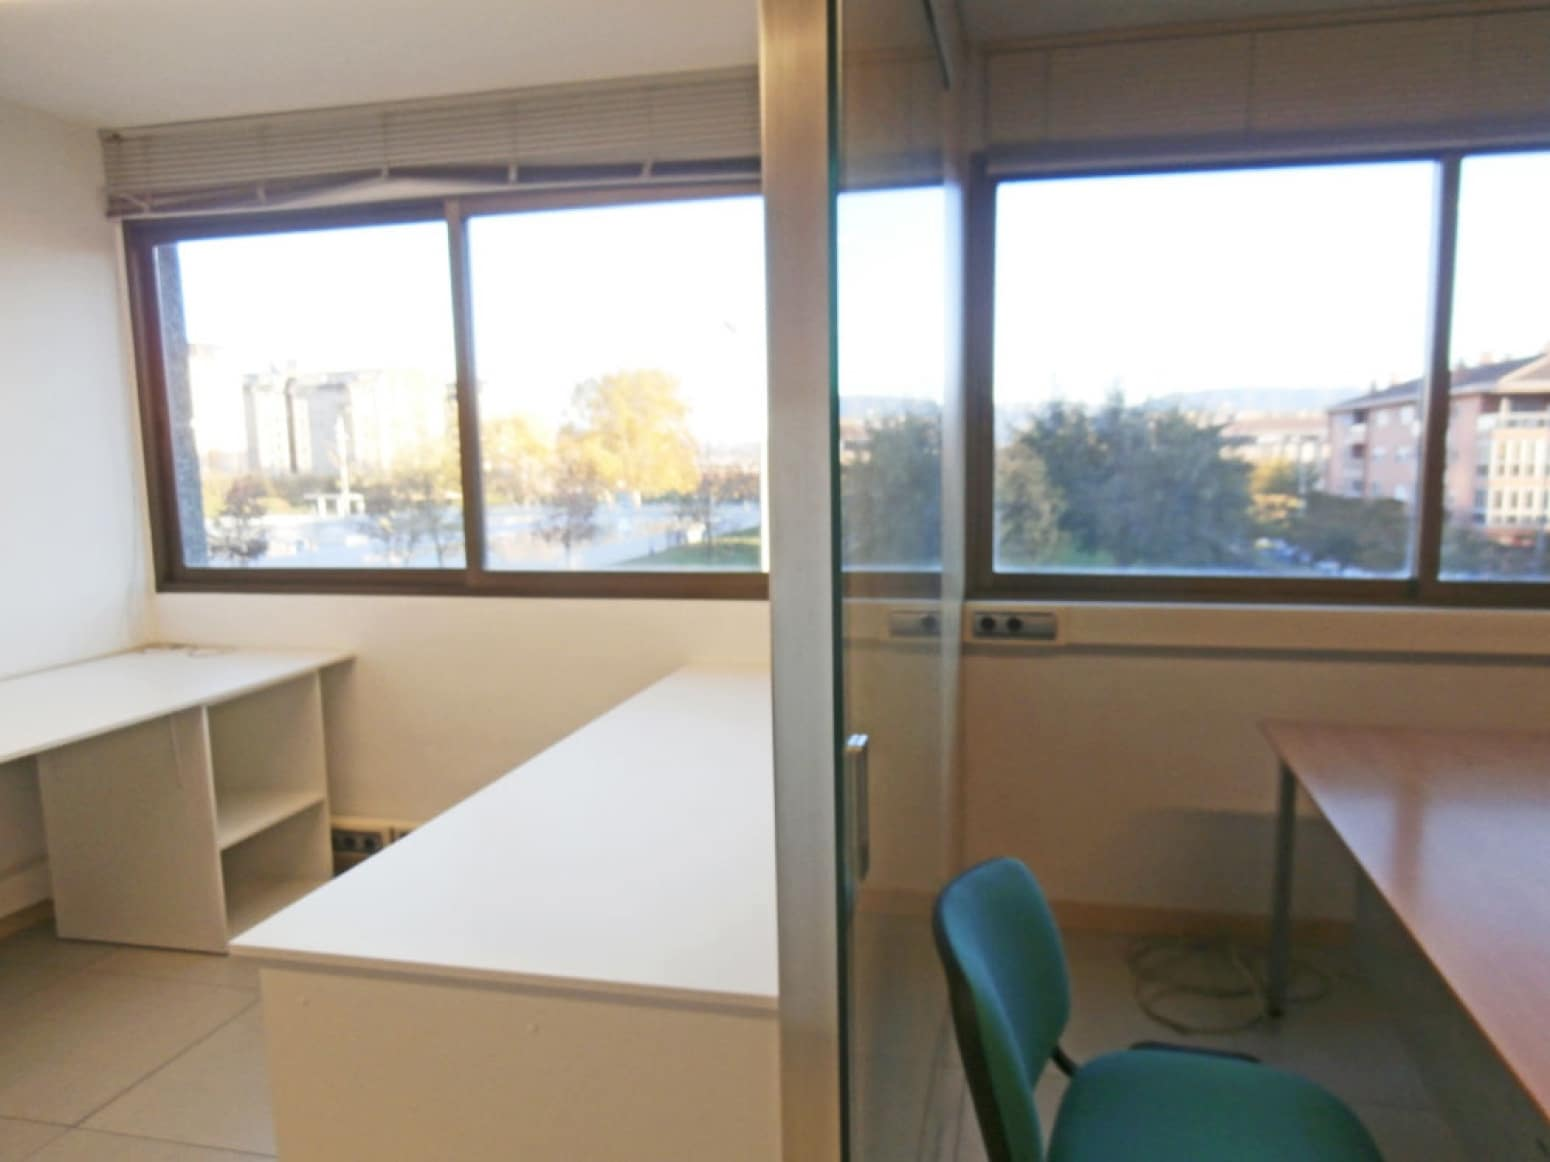 Office for rent in Zizur Mayor / Zizur Nagusia - € 250 (Ref: 5136623)